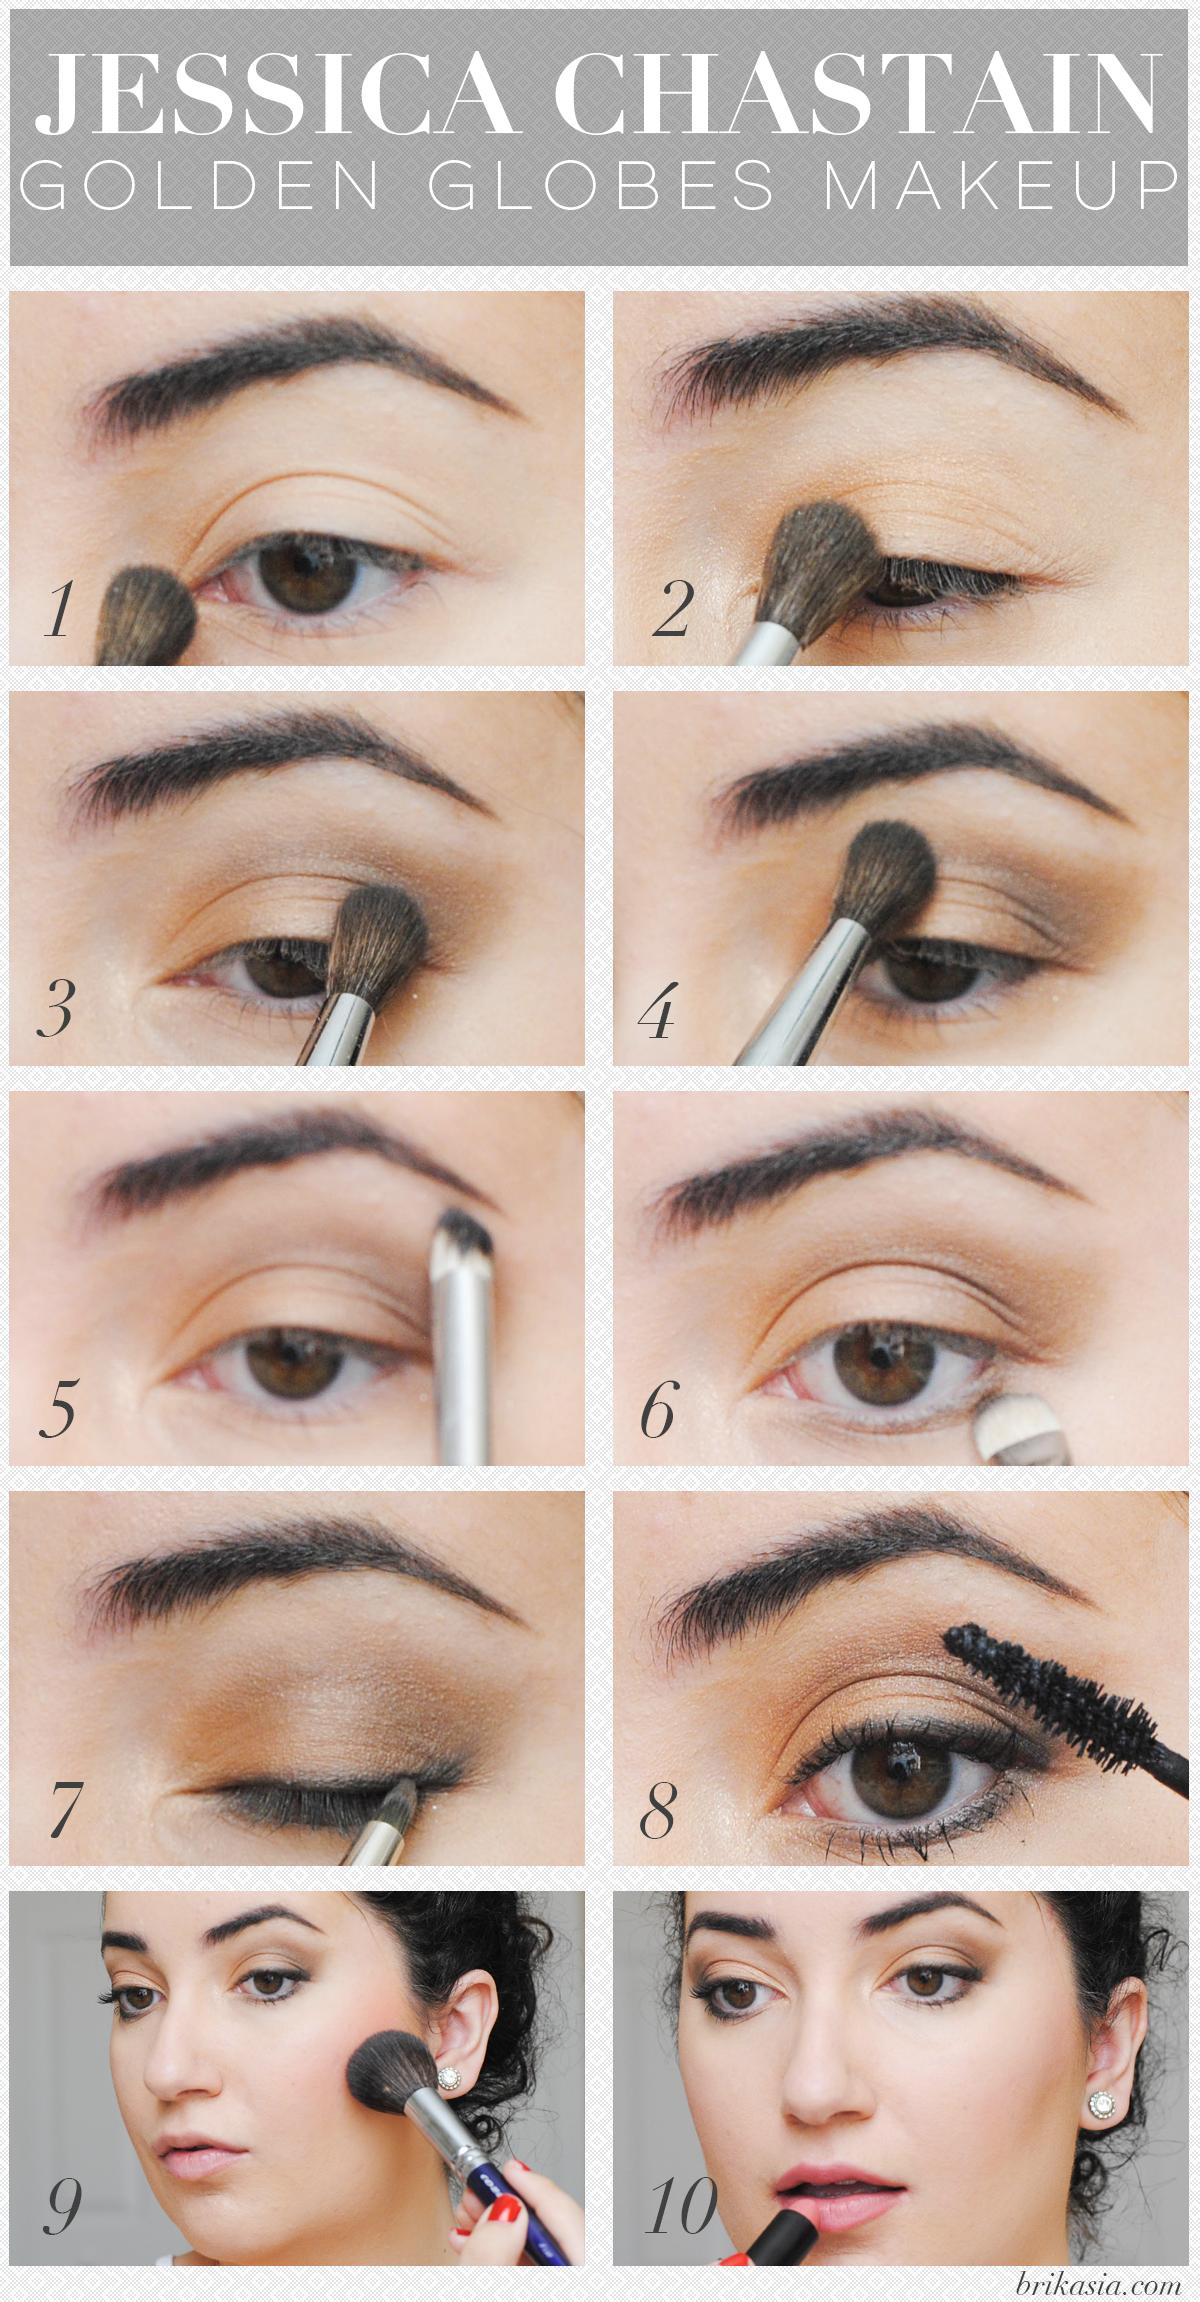 Jessica Chastain Golden Globes Makeup Tutorial